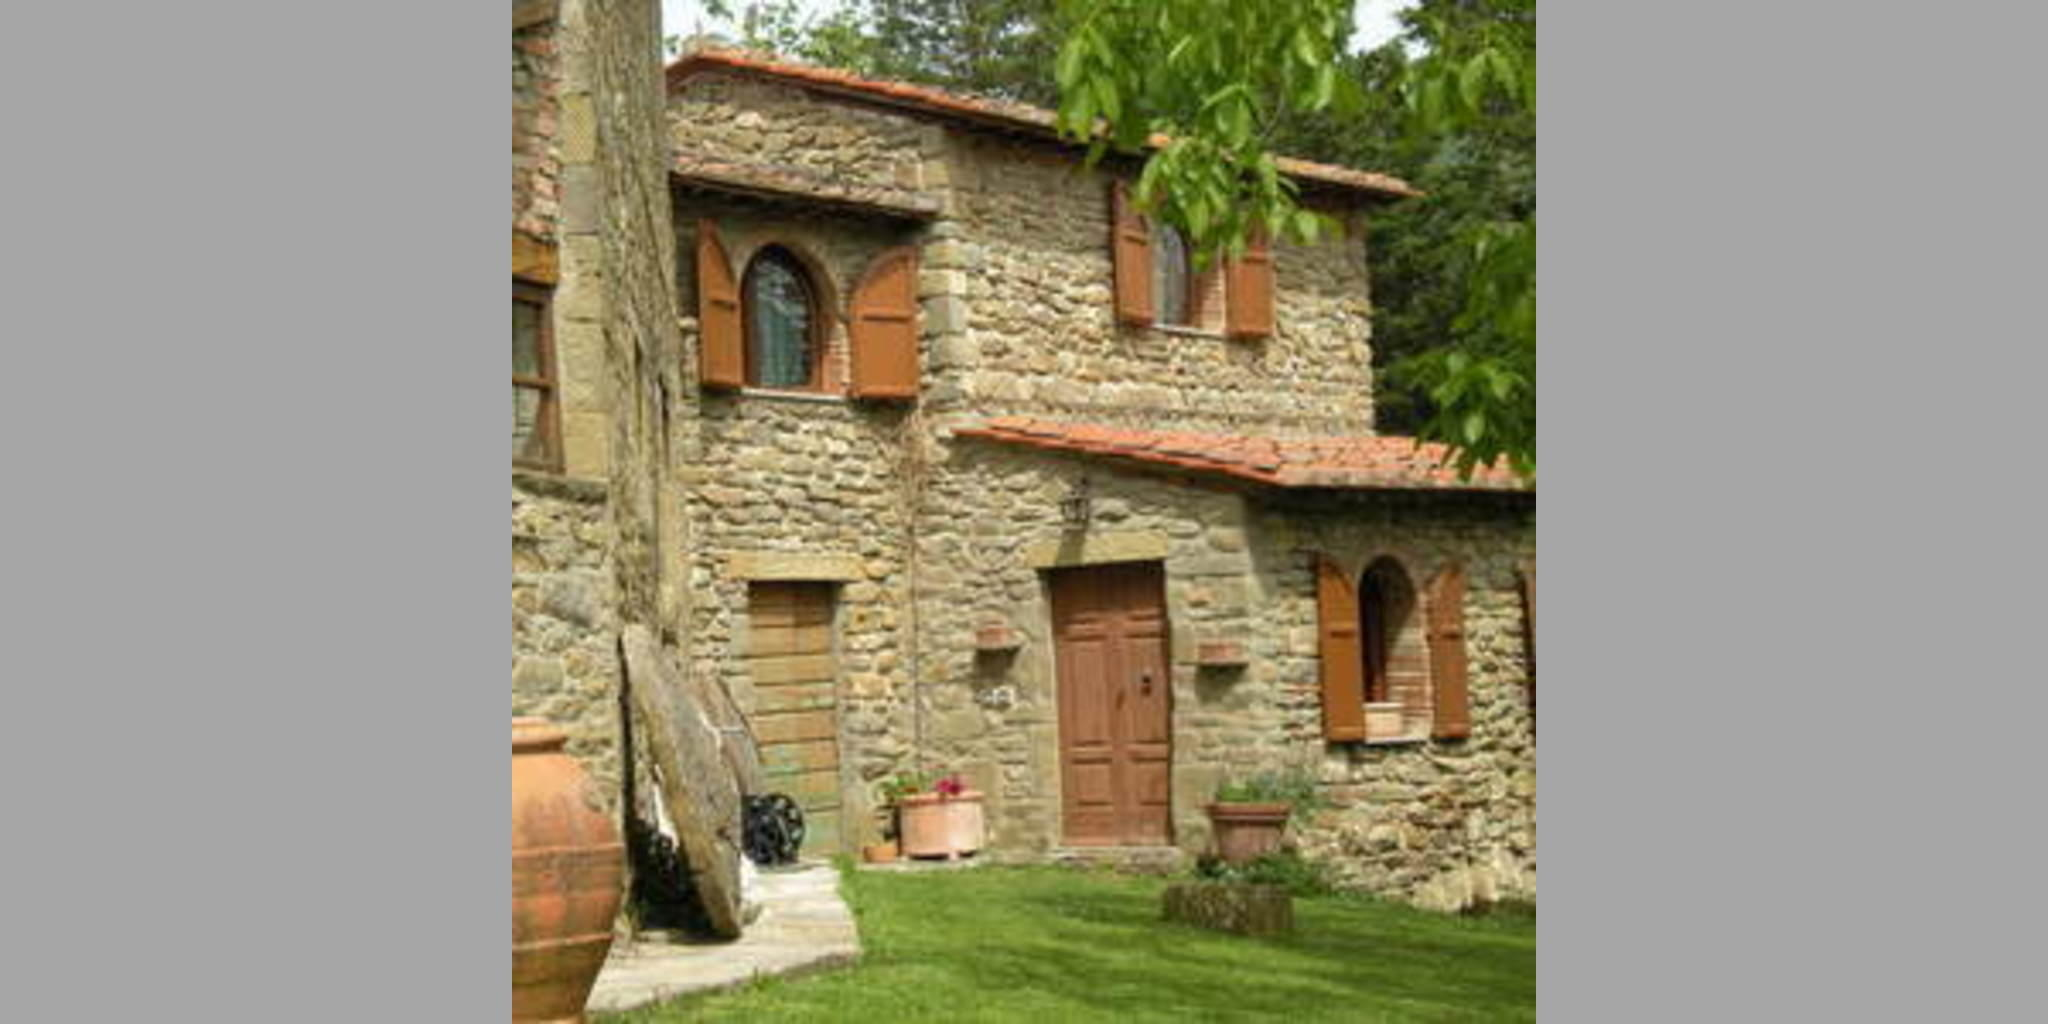 Ferienbauernhof Cortona - Montanare Di Cortona